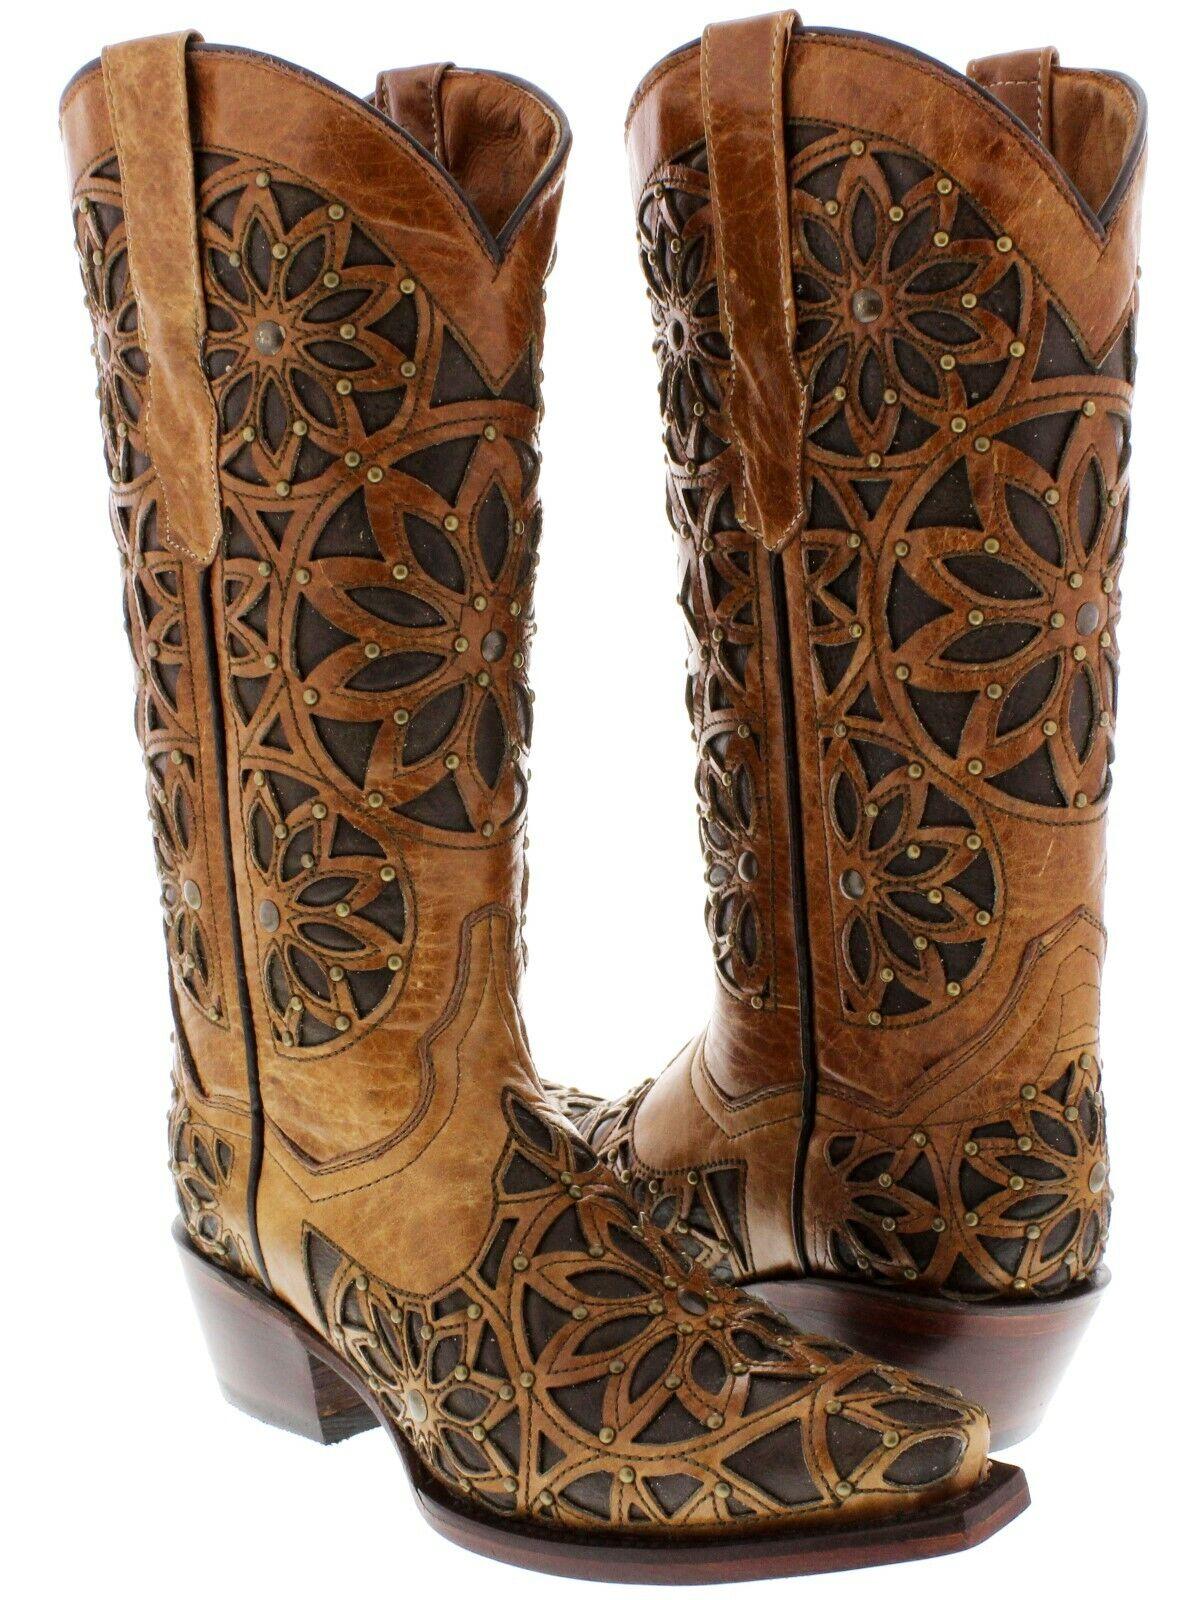 Senza tasse donna Light Marrone Inlay Design Western Studded Studded Studded Leather Cowgirl stivali Snip Toe  lo stile classico